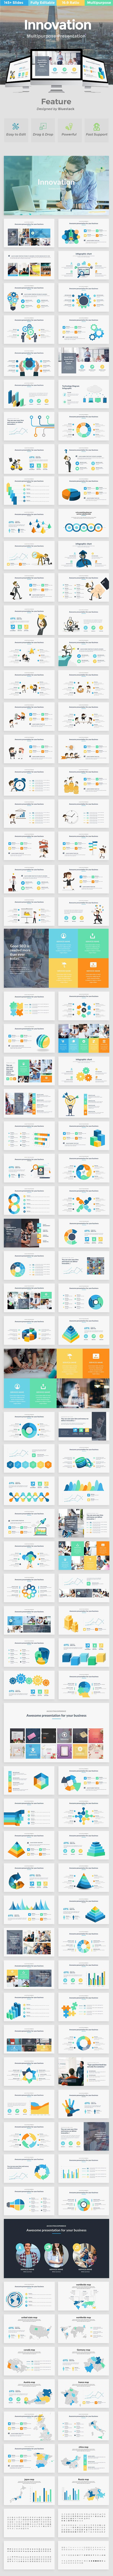 Innovation Company Business Google Slide Template - Google Slides Presentation Templates